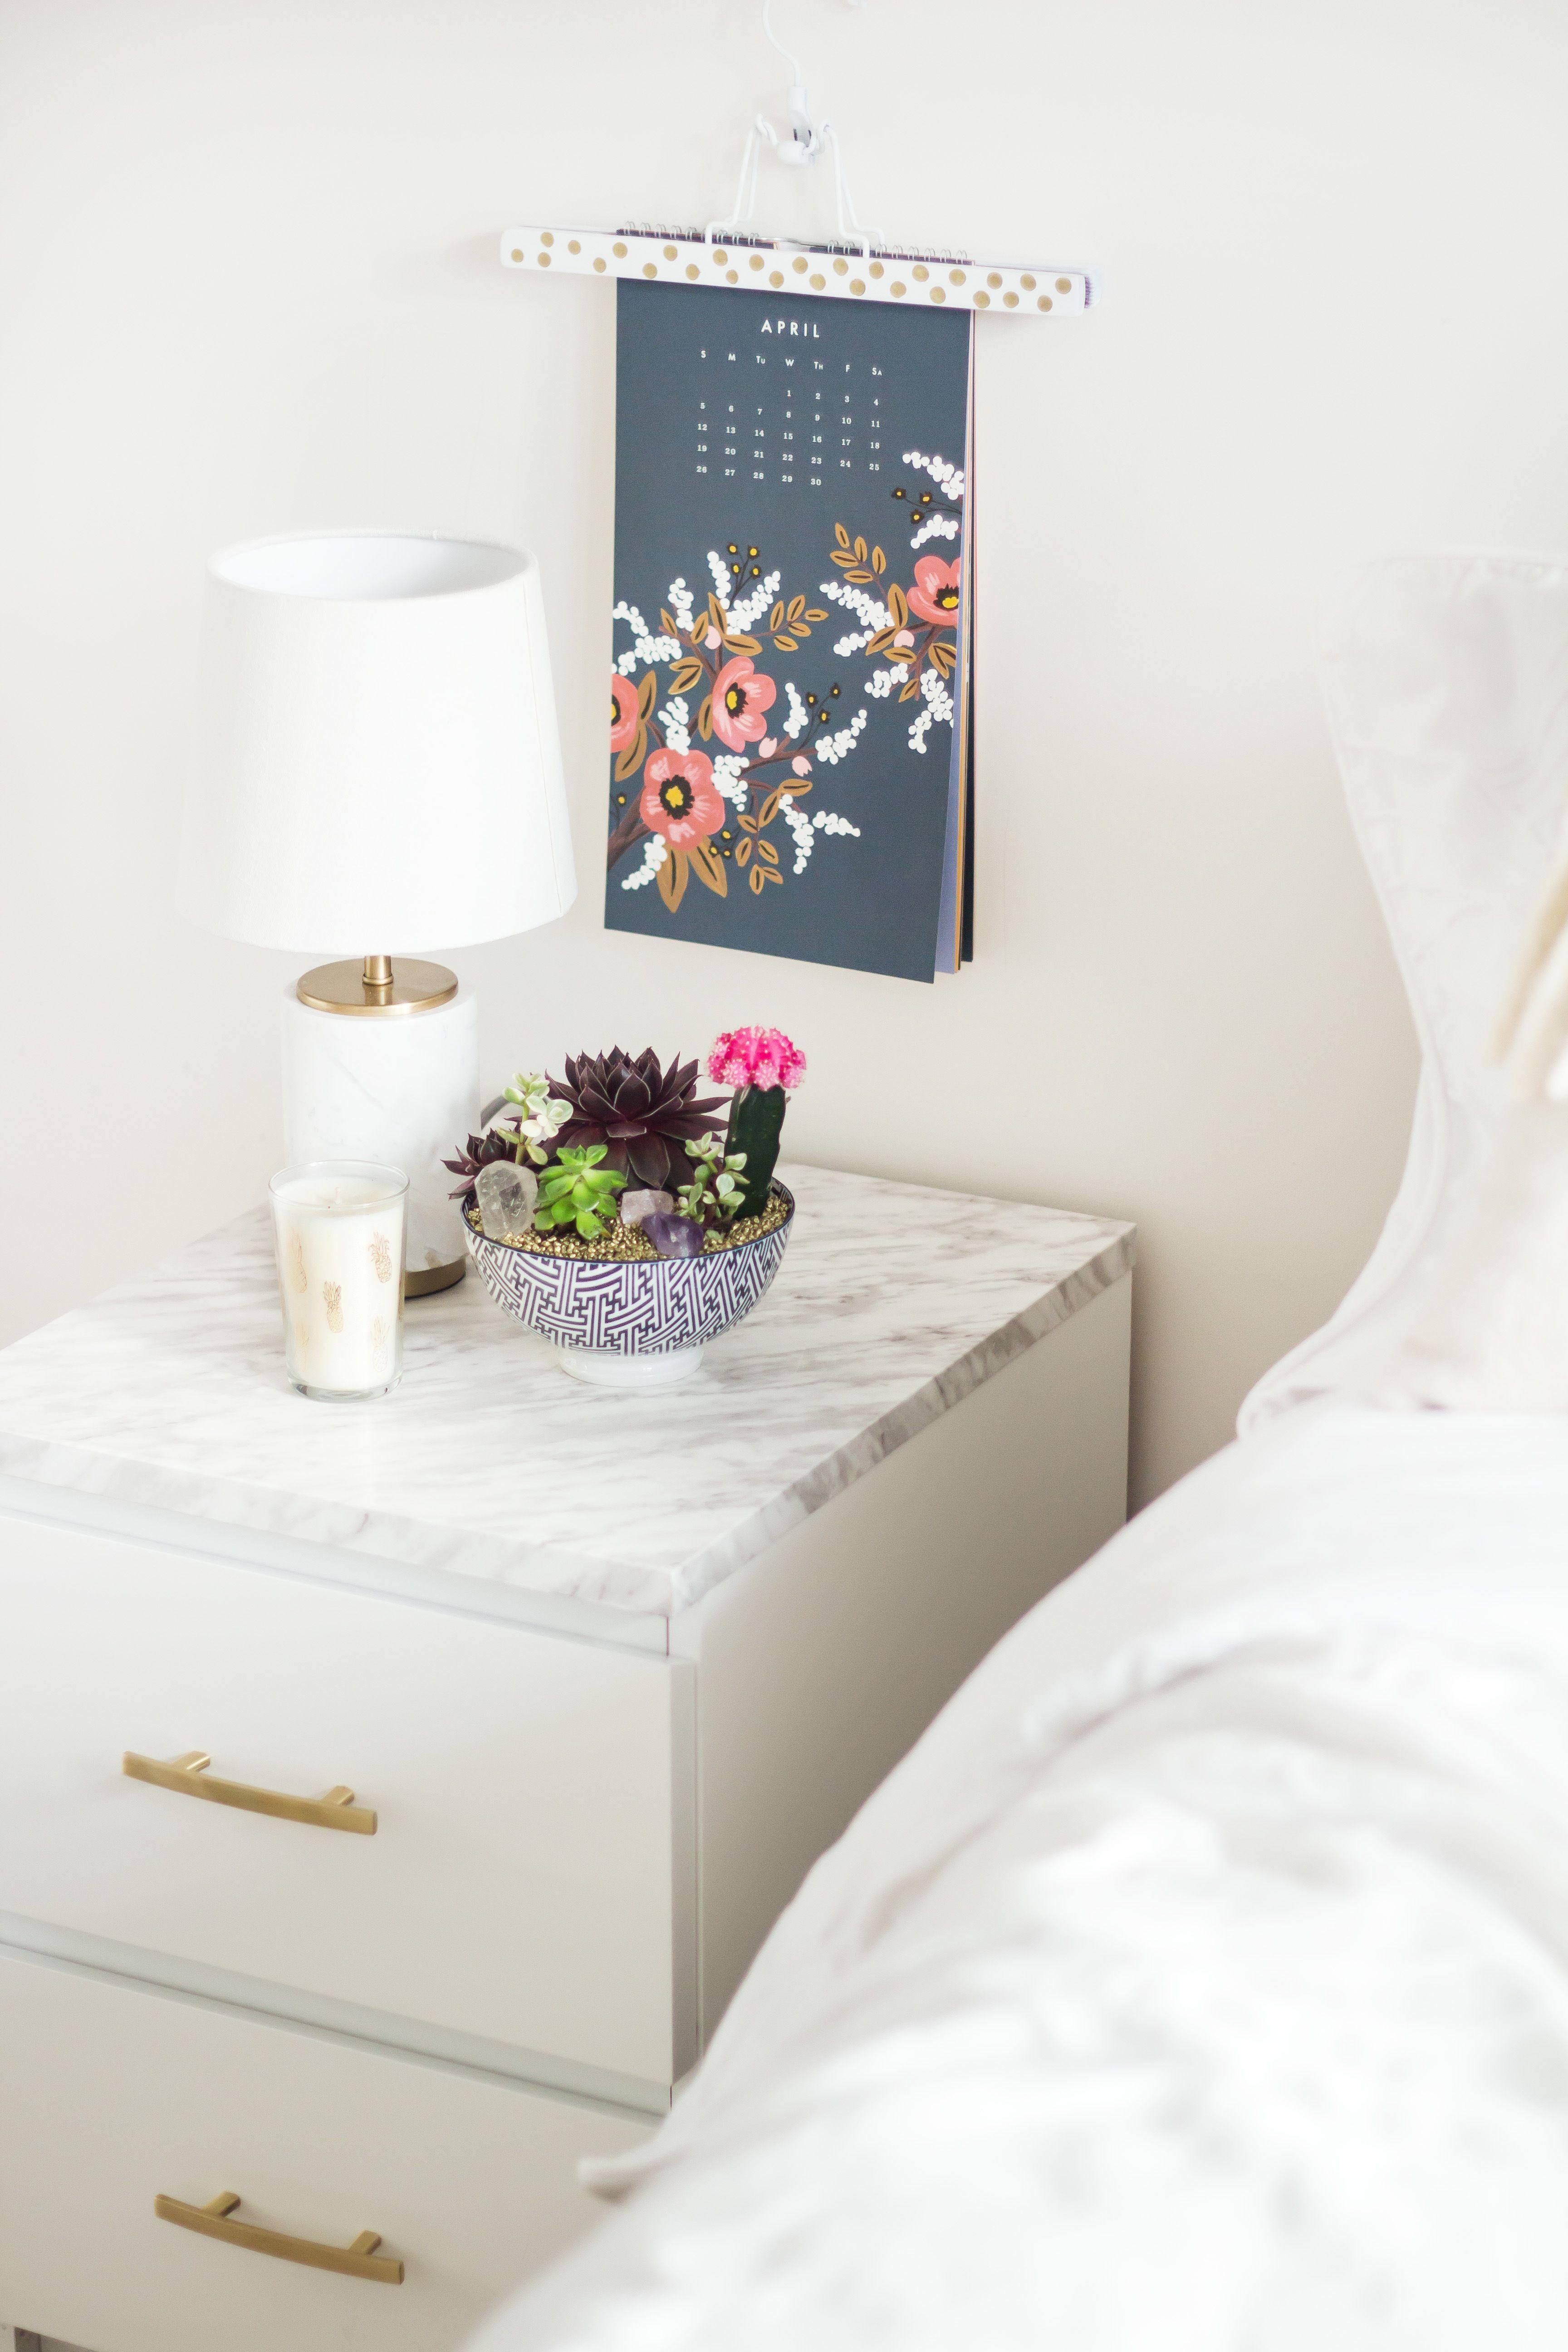 Ikea Malm End Table DIY | For the Home | Pinterest | Ikea malm, Malm ...